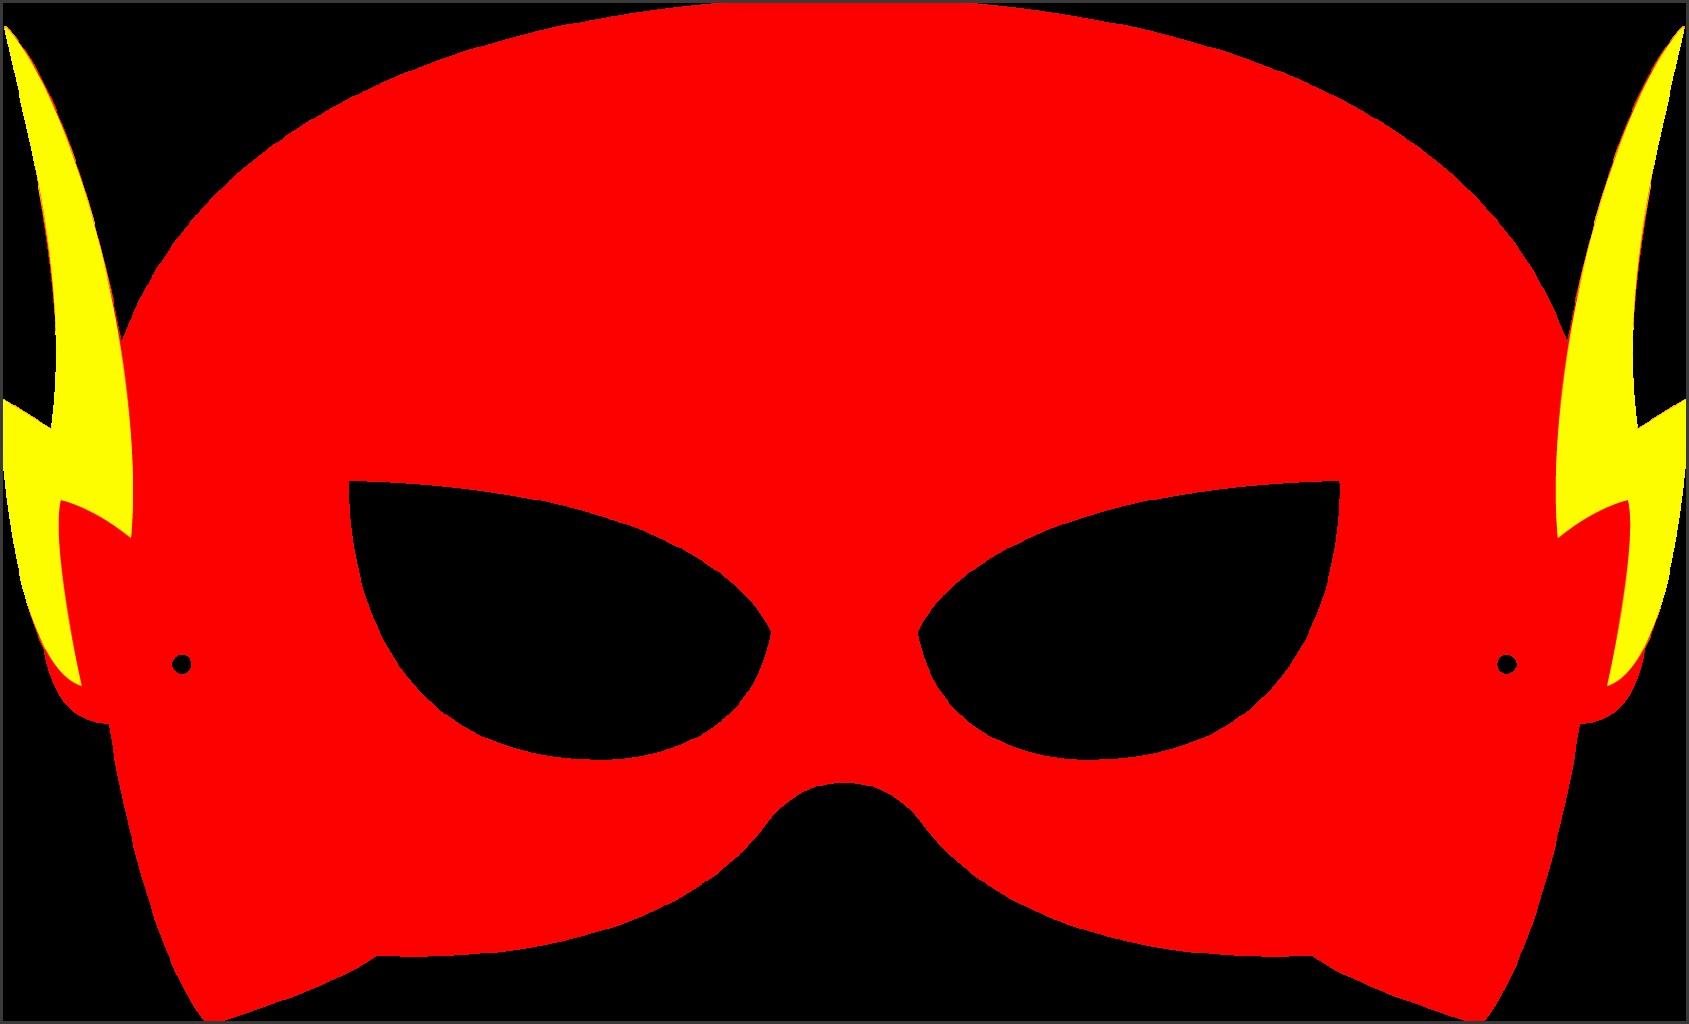 xprintable superhero mask daredevil gespeed ic AnhmvMlGj7